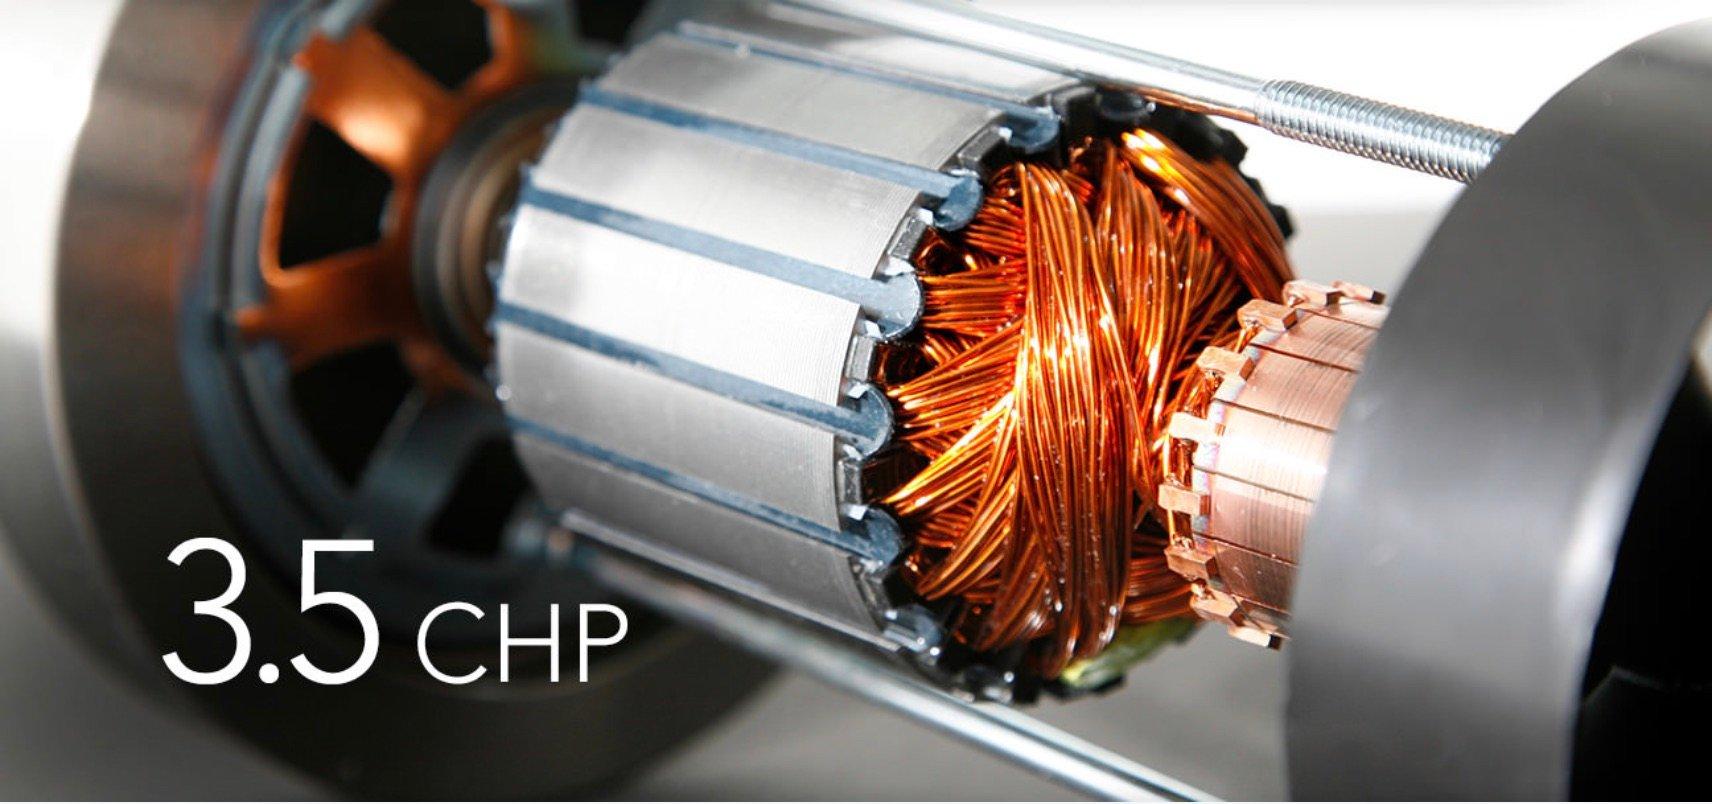 ProForm Mach Z Motor